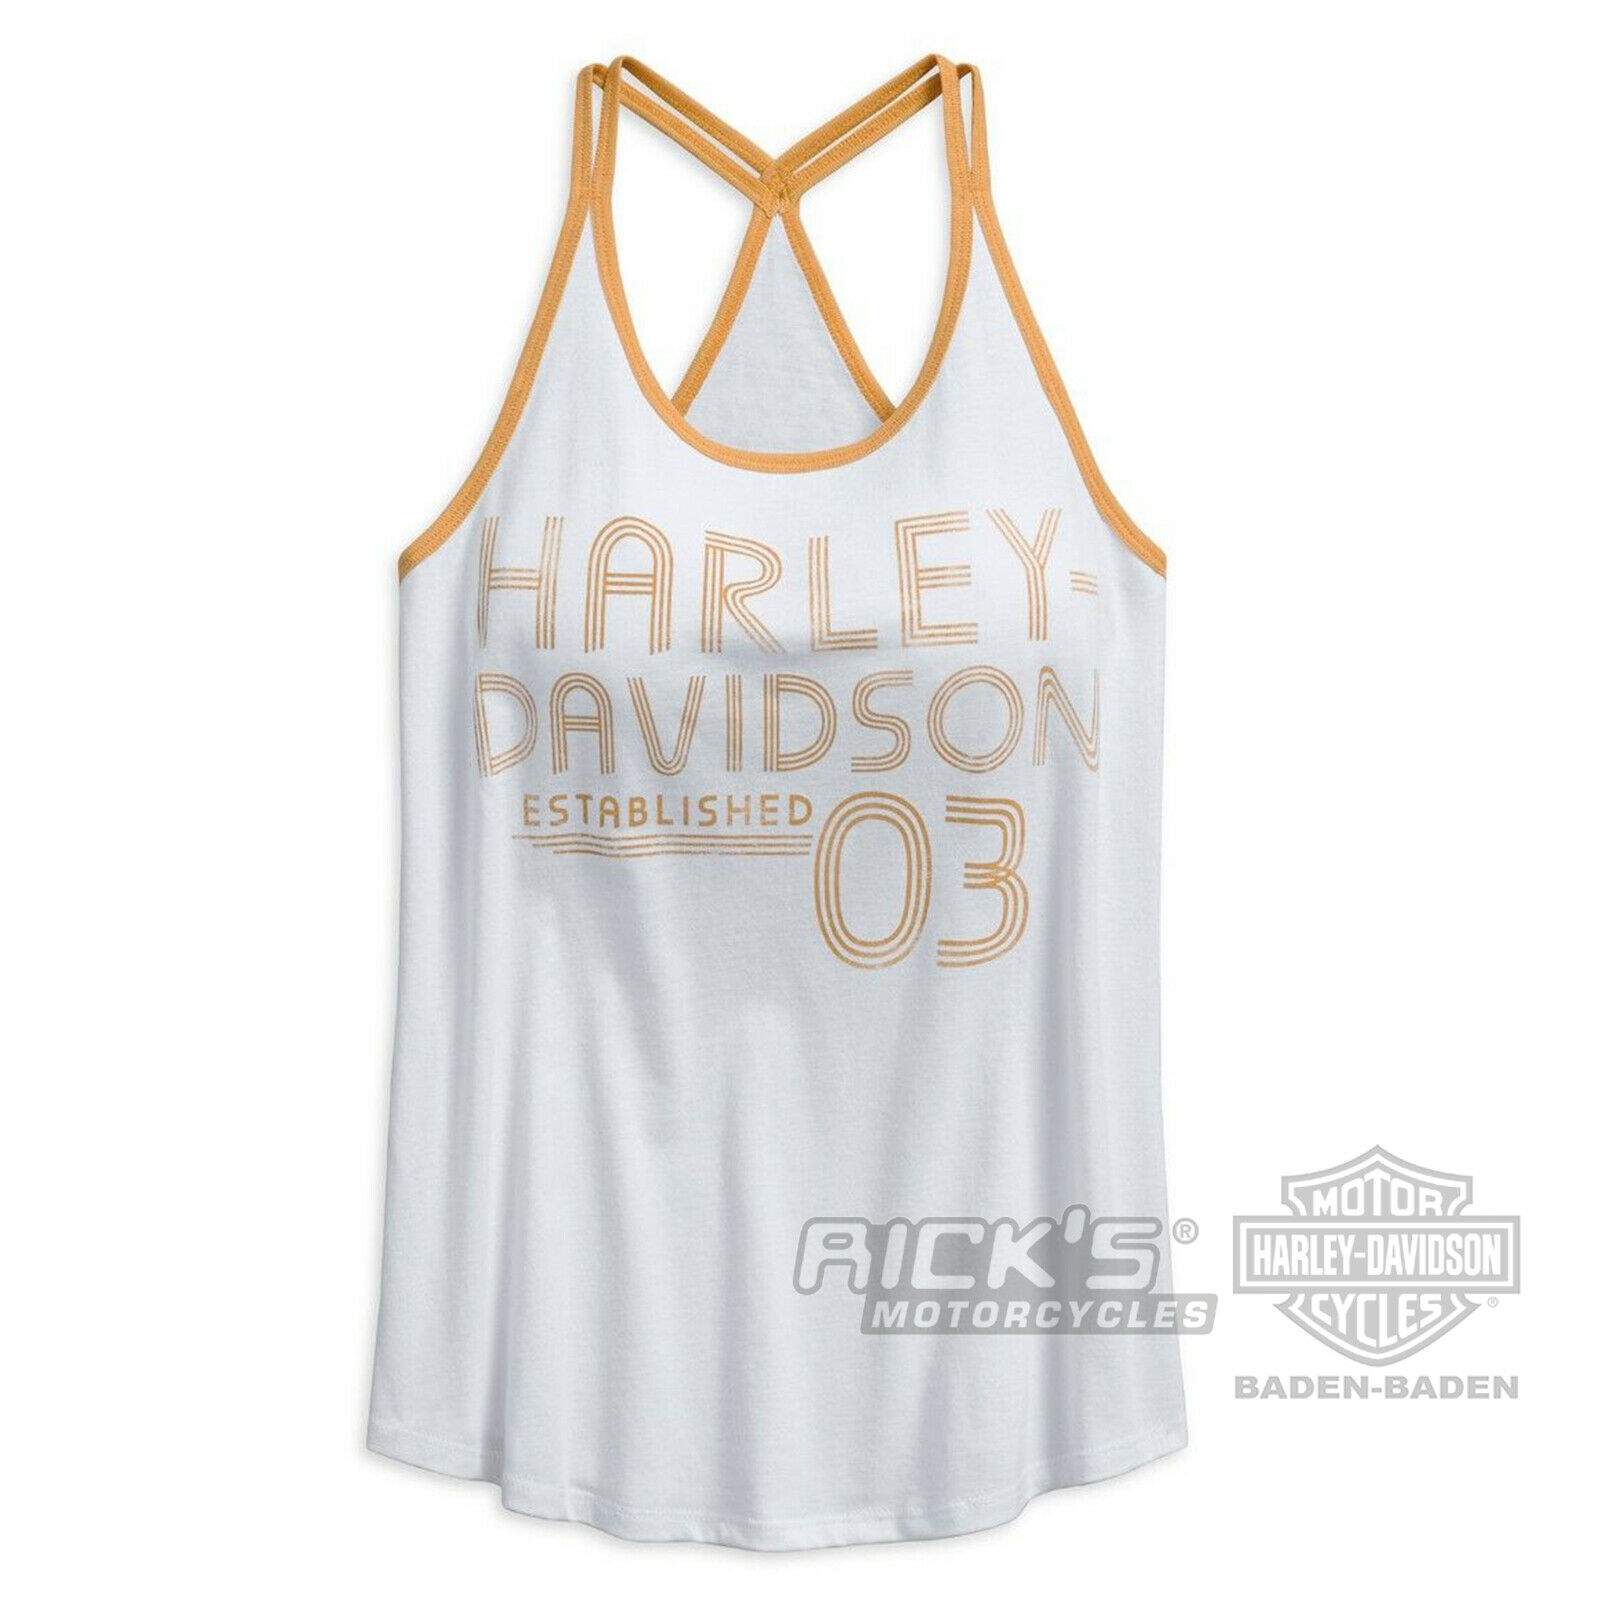 Rick `s HARLEY DAVIDSON donna canottiera - Maglia 96241-18vw